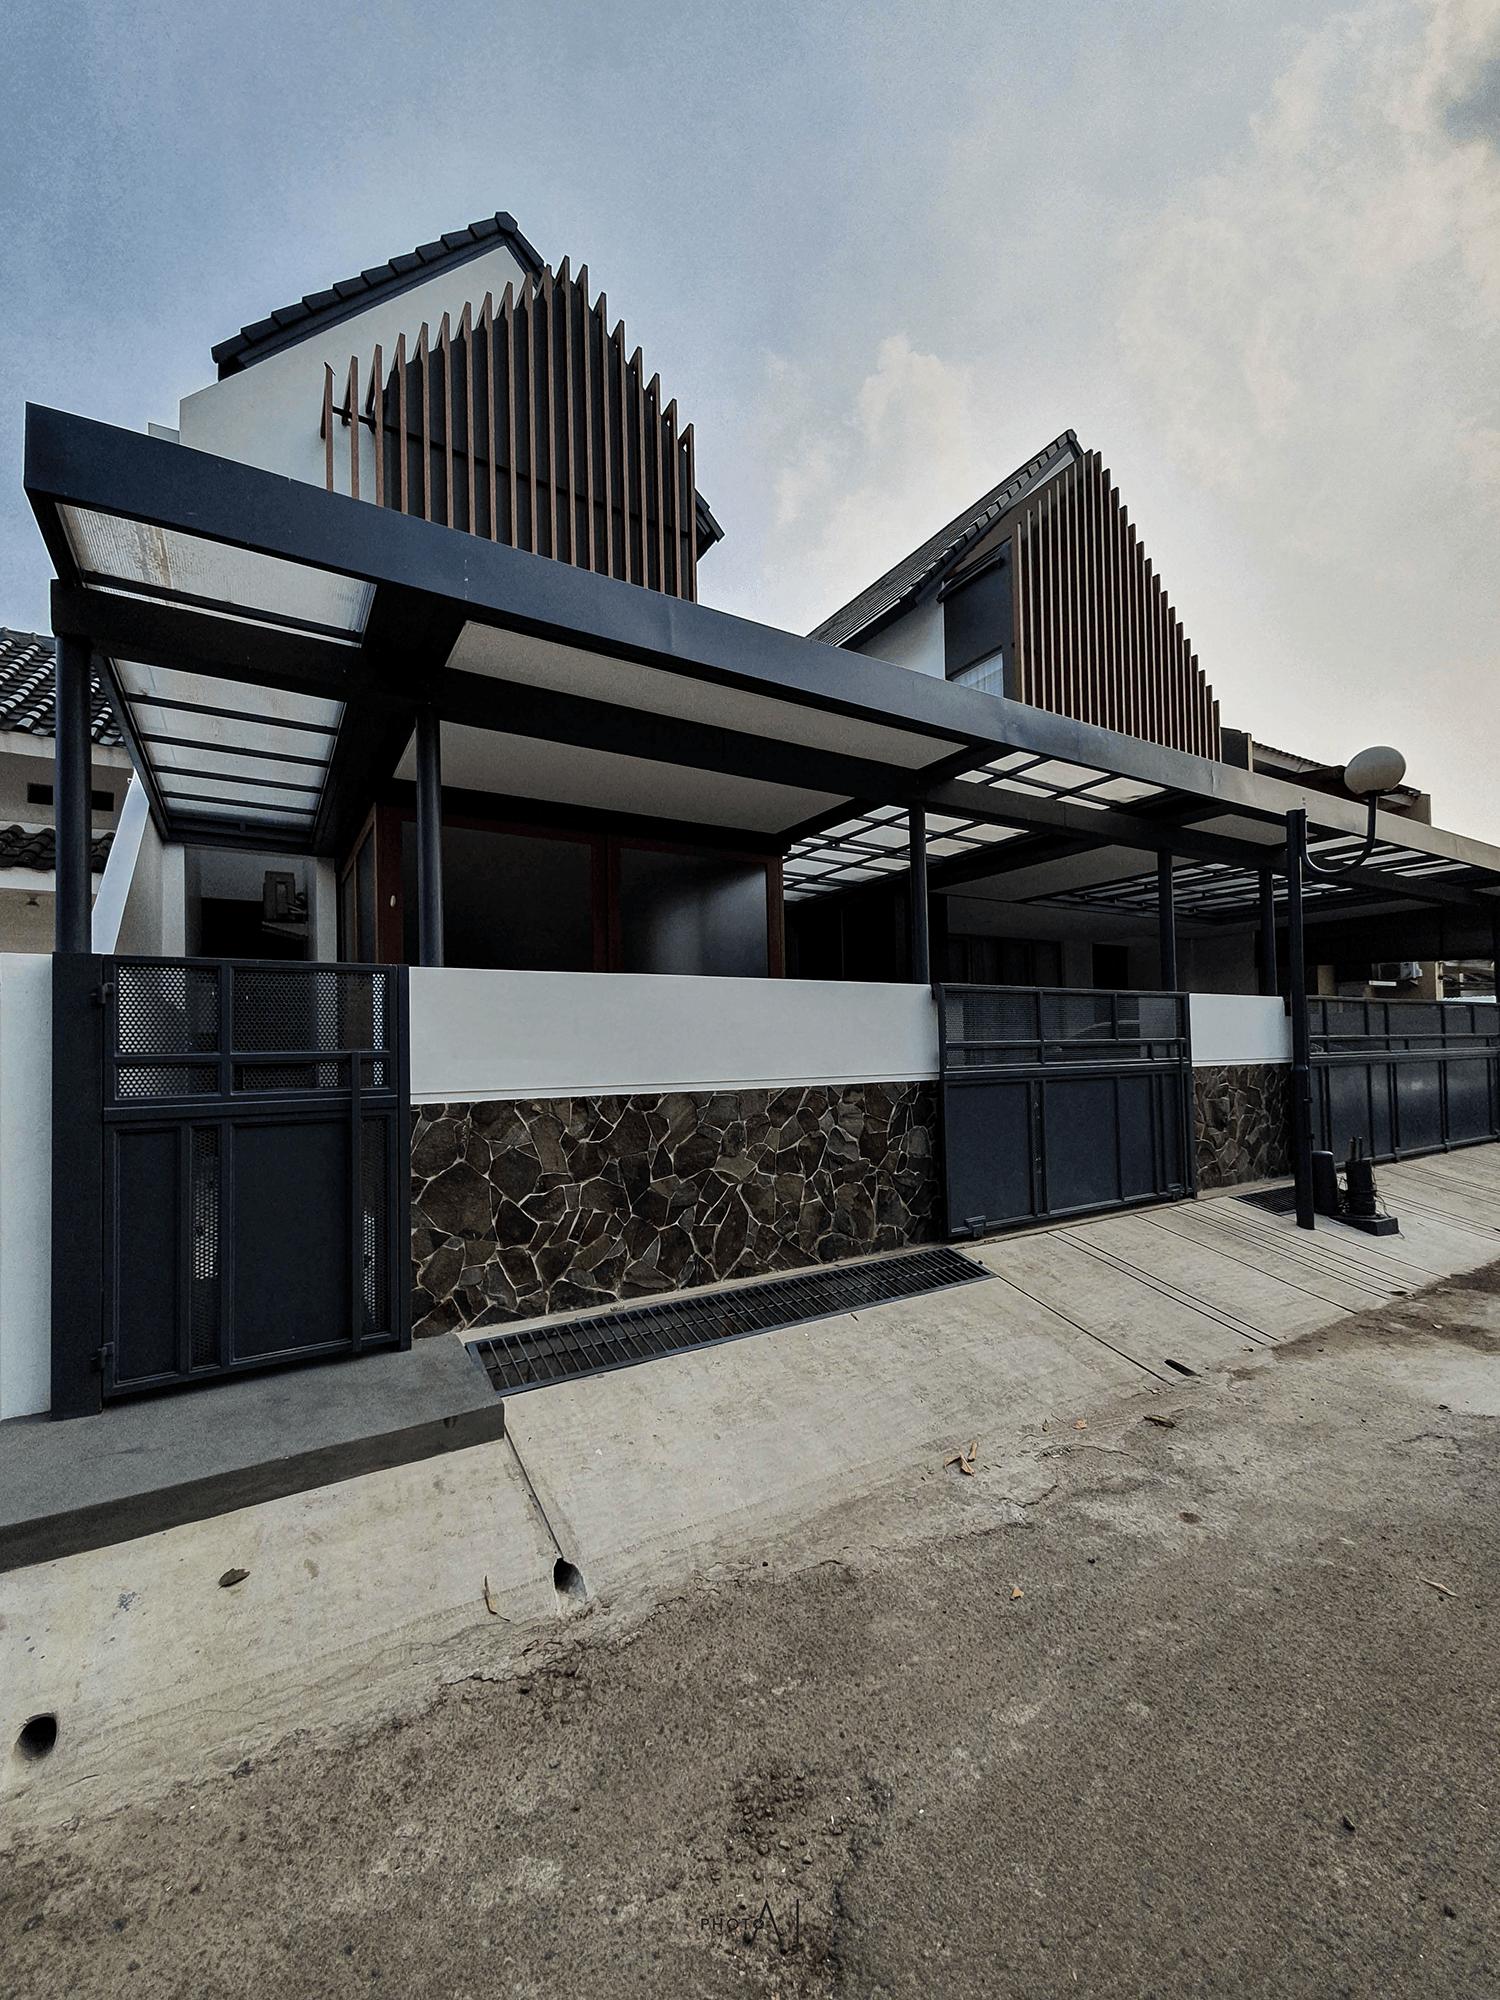 Monokroma Architect Zen House Lippo Karawaci, Binong, Kec. Curug, Tangerang, Banten, Indonesia Lippo Karawaci, Binong, Kec. Curug, Tangerang, Banten, Indonesia Monokroma-Architect-Zen-House   88919